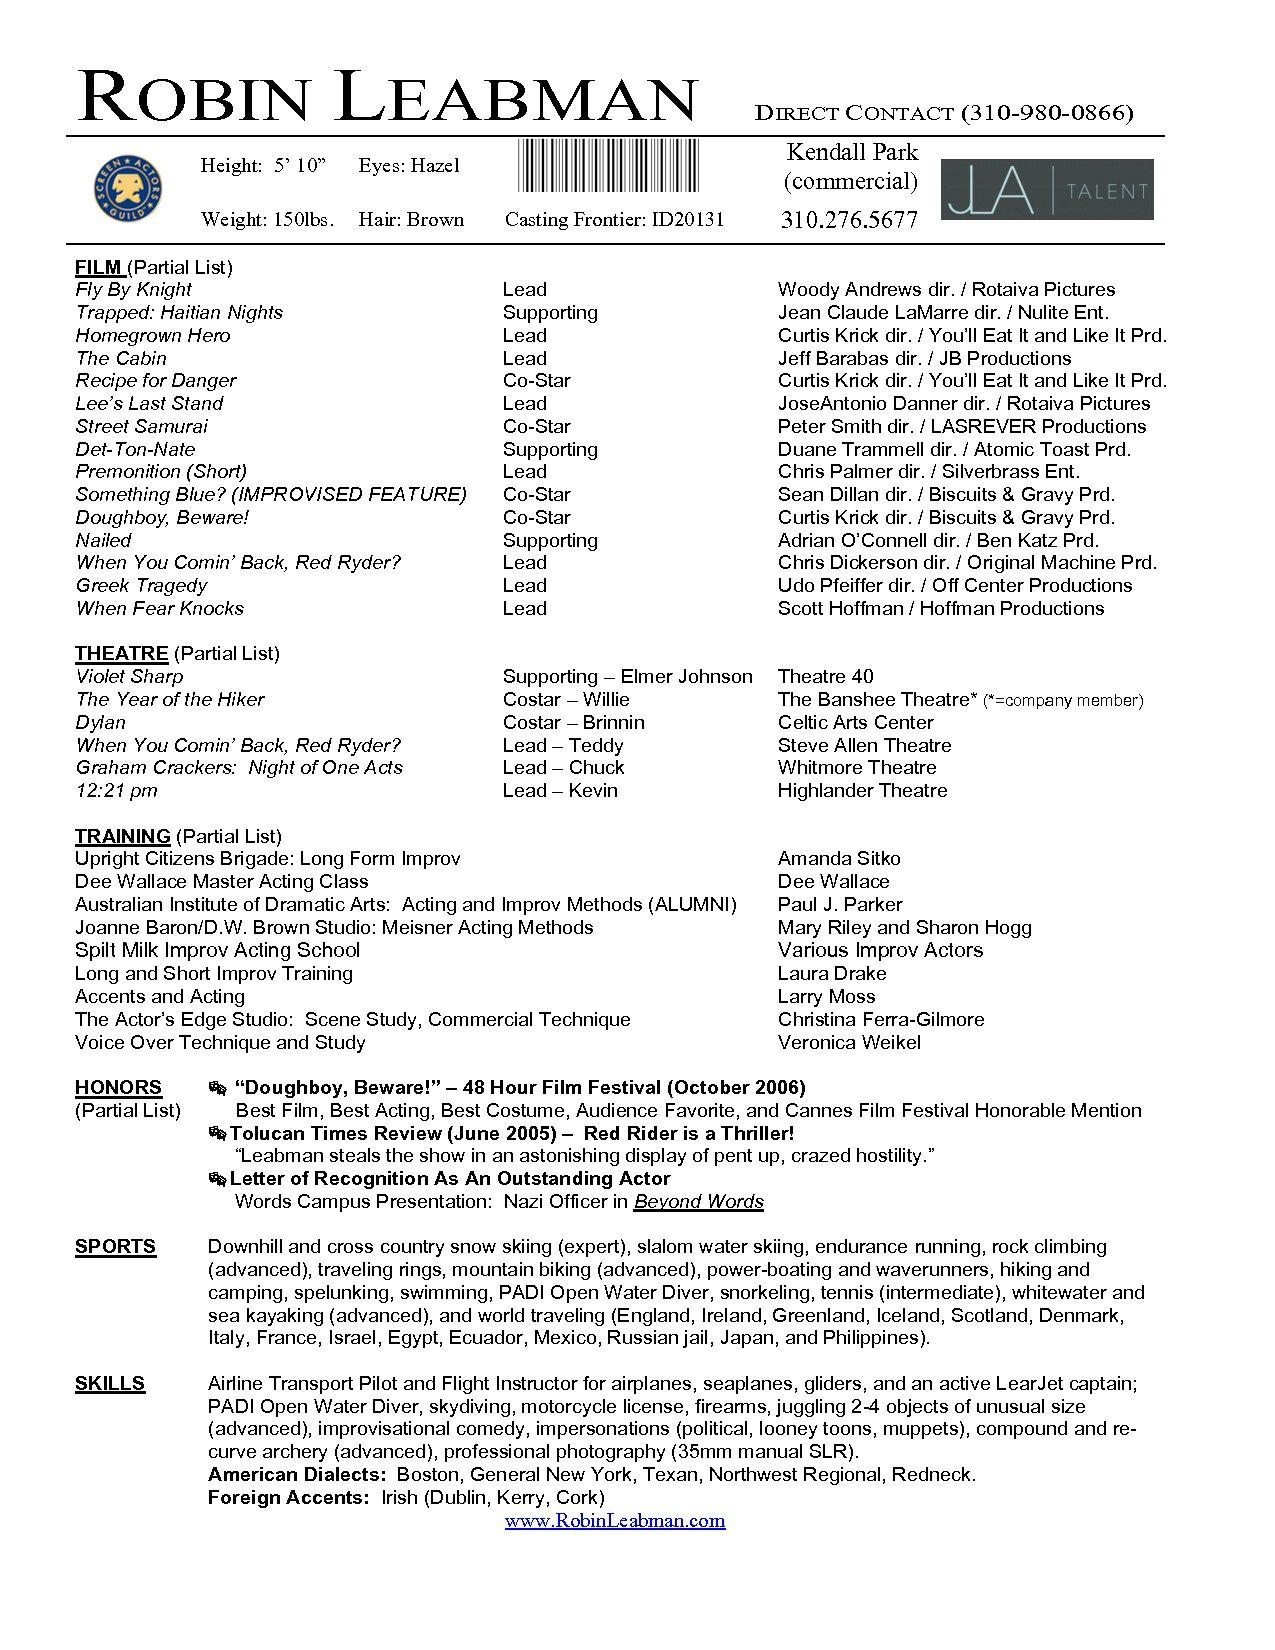 Actor Resume Template Microsoft Word